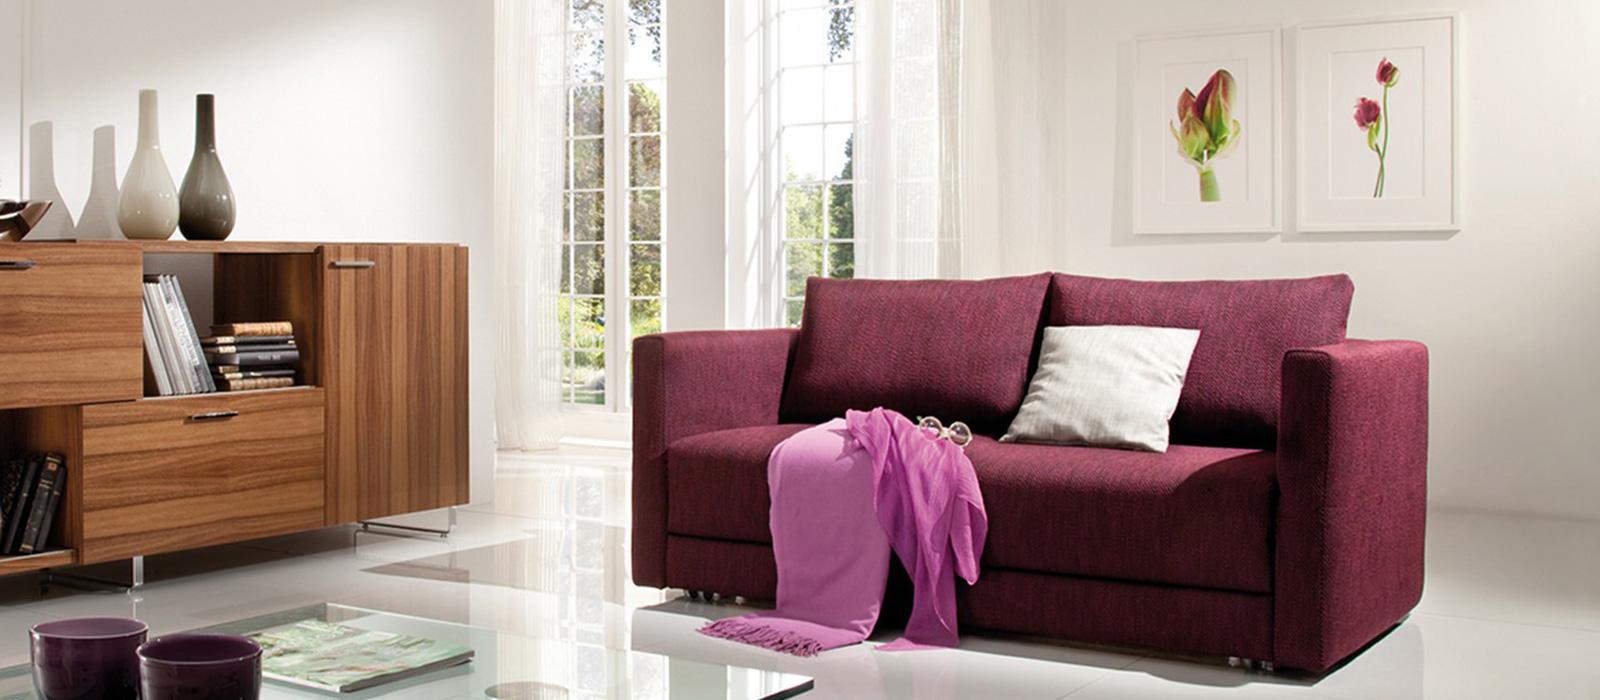 blu schlafsofa von franz fertig sofabed. Black Bedroom Furniture Sets. Home Design Ideas